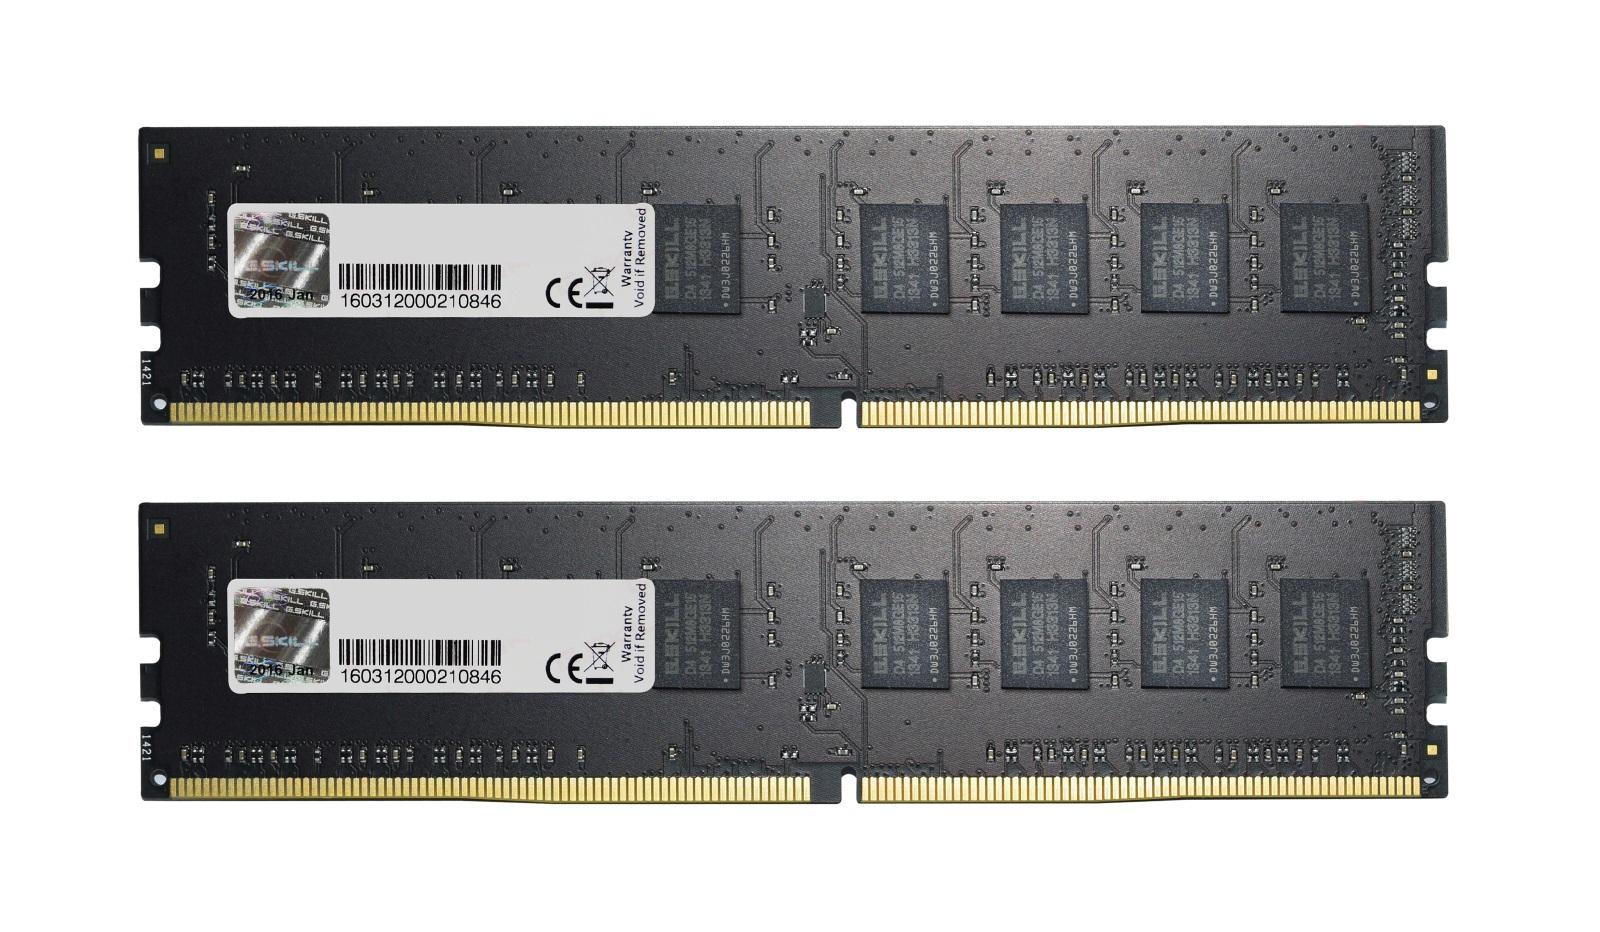 16GB G.Skill DDR4 2400MHz PC4-19200 CL15 NS Value Series Dual Channel Kit (2x8GB)